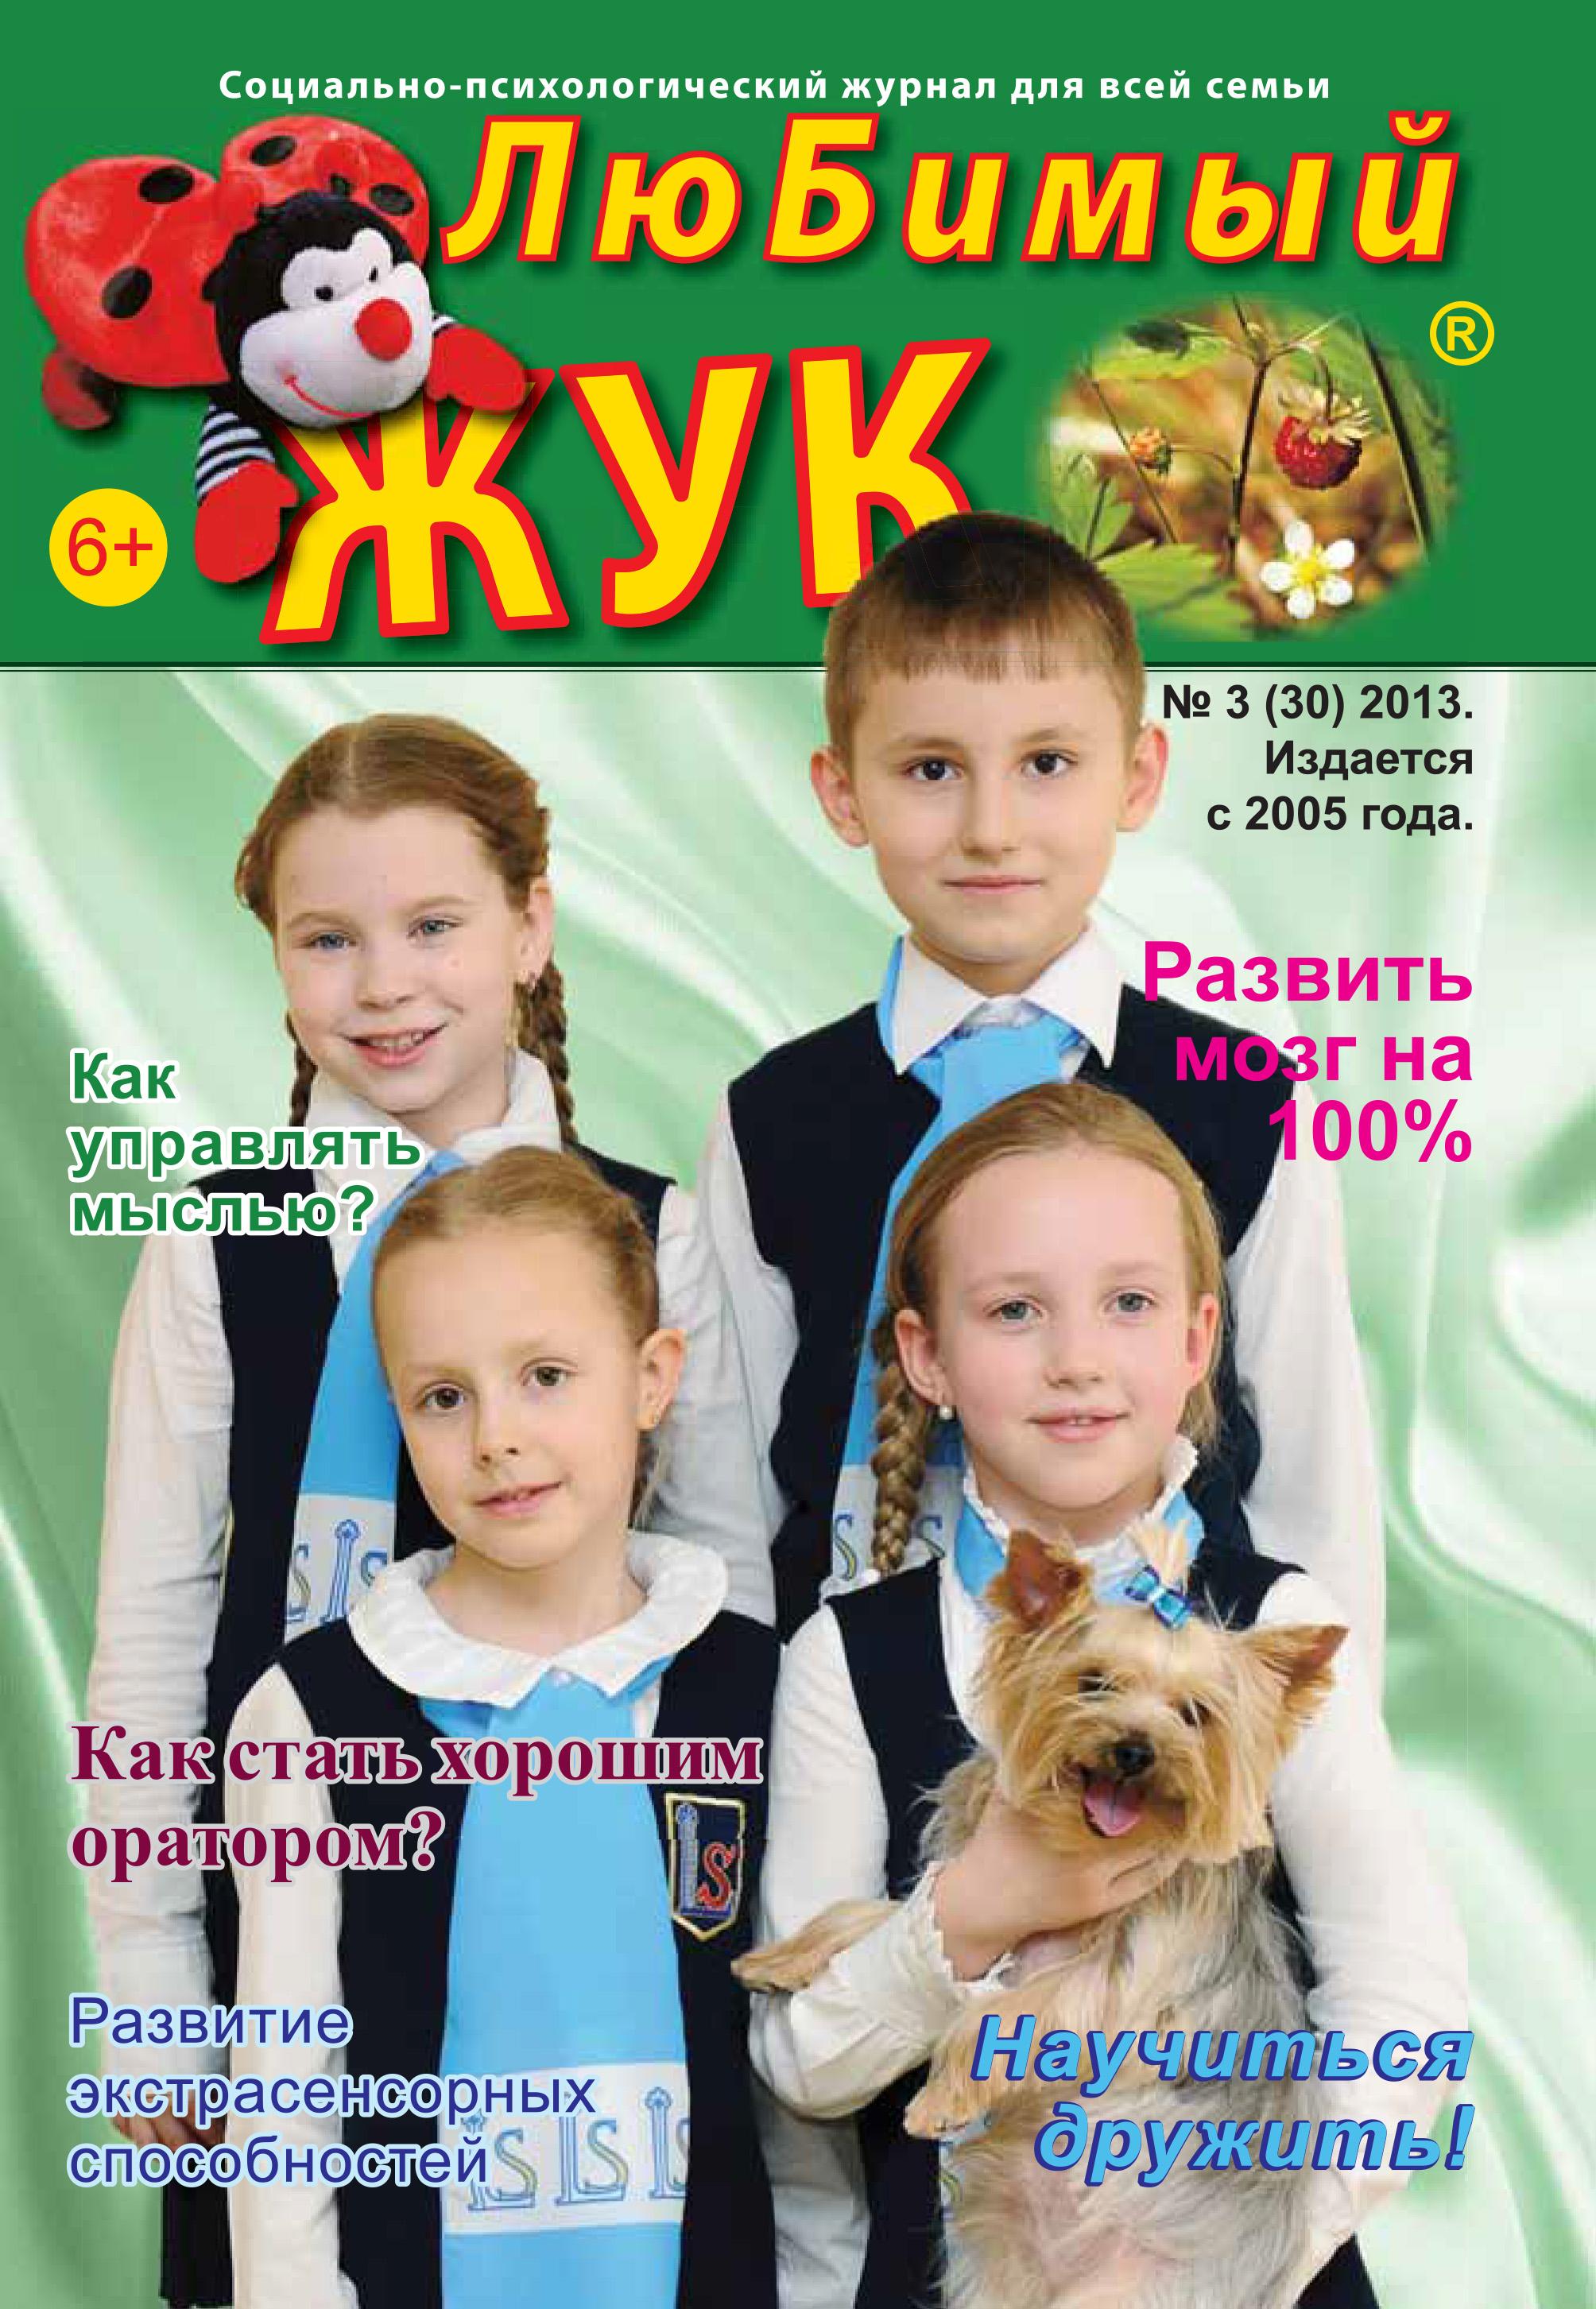 ЛюБимый Жук, №3 (30) 2013